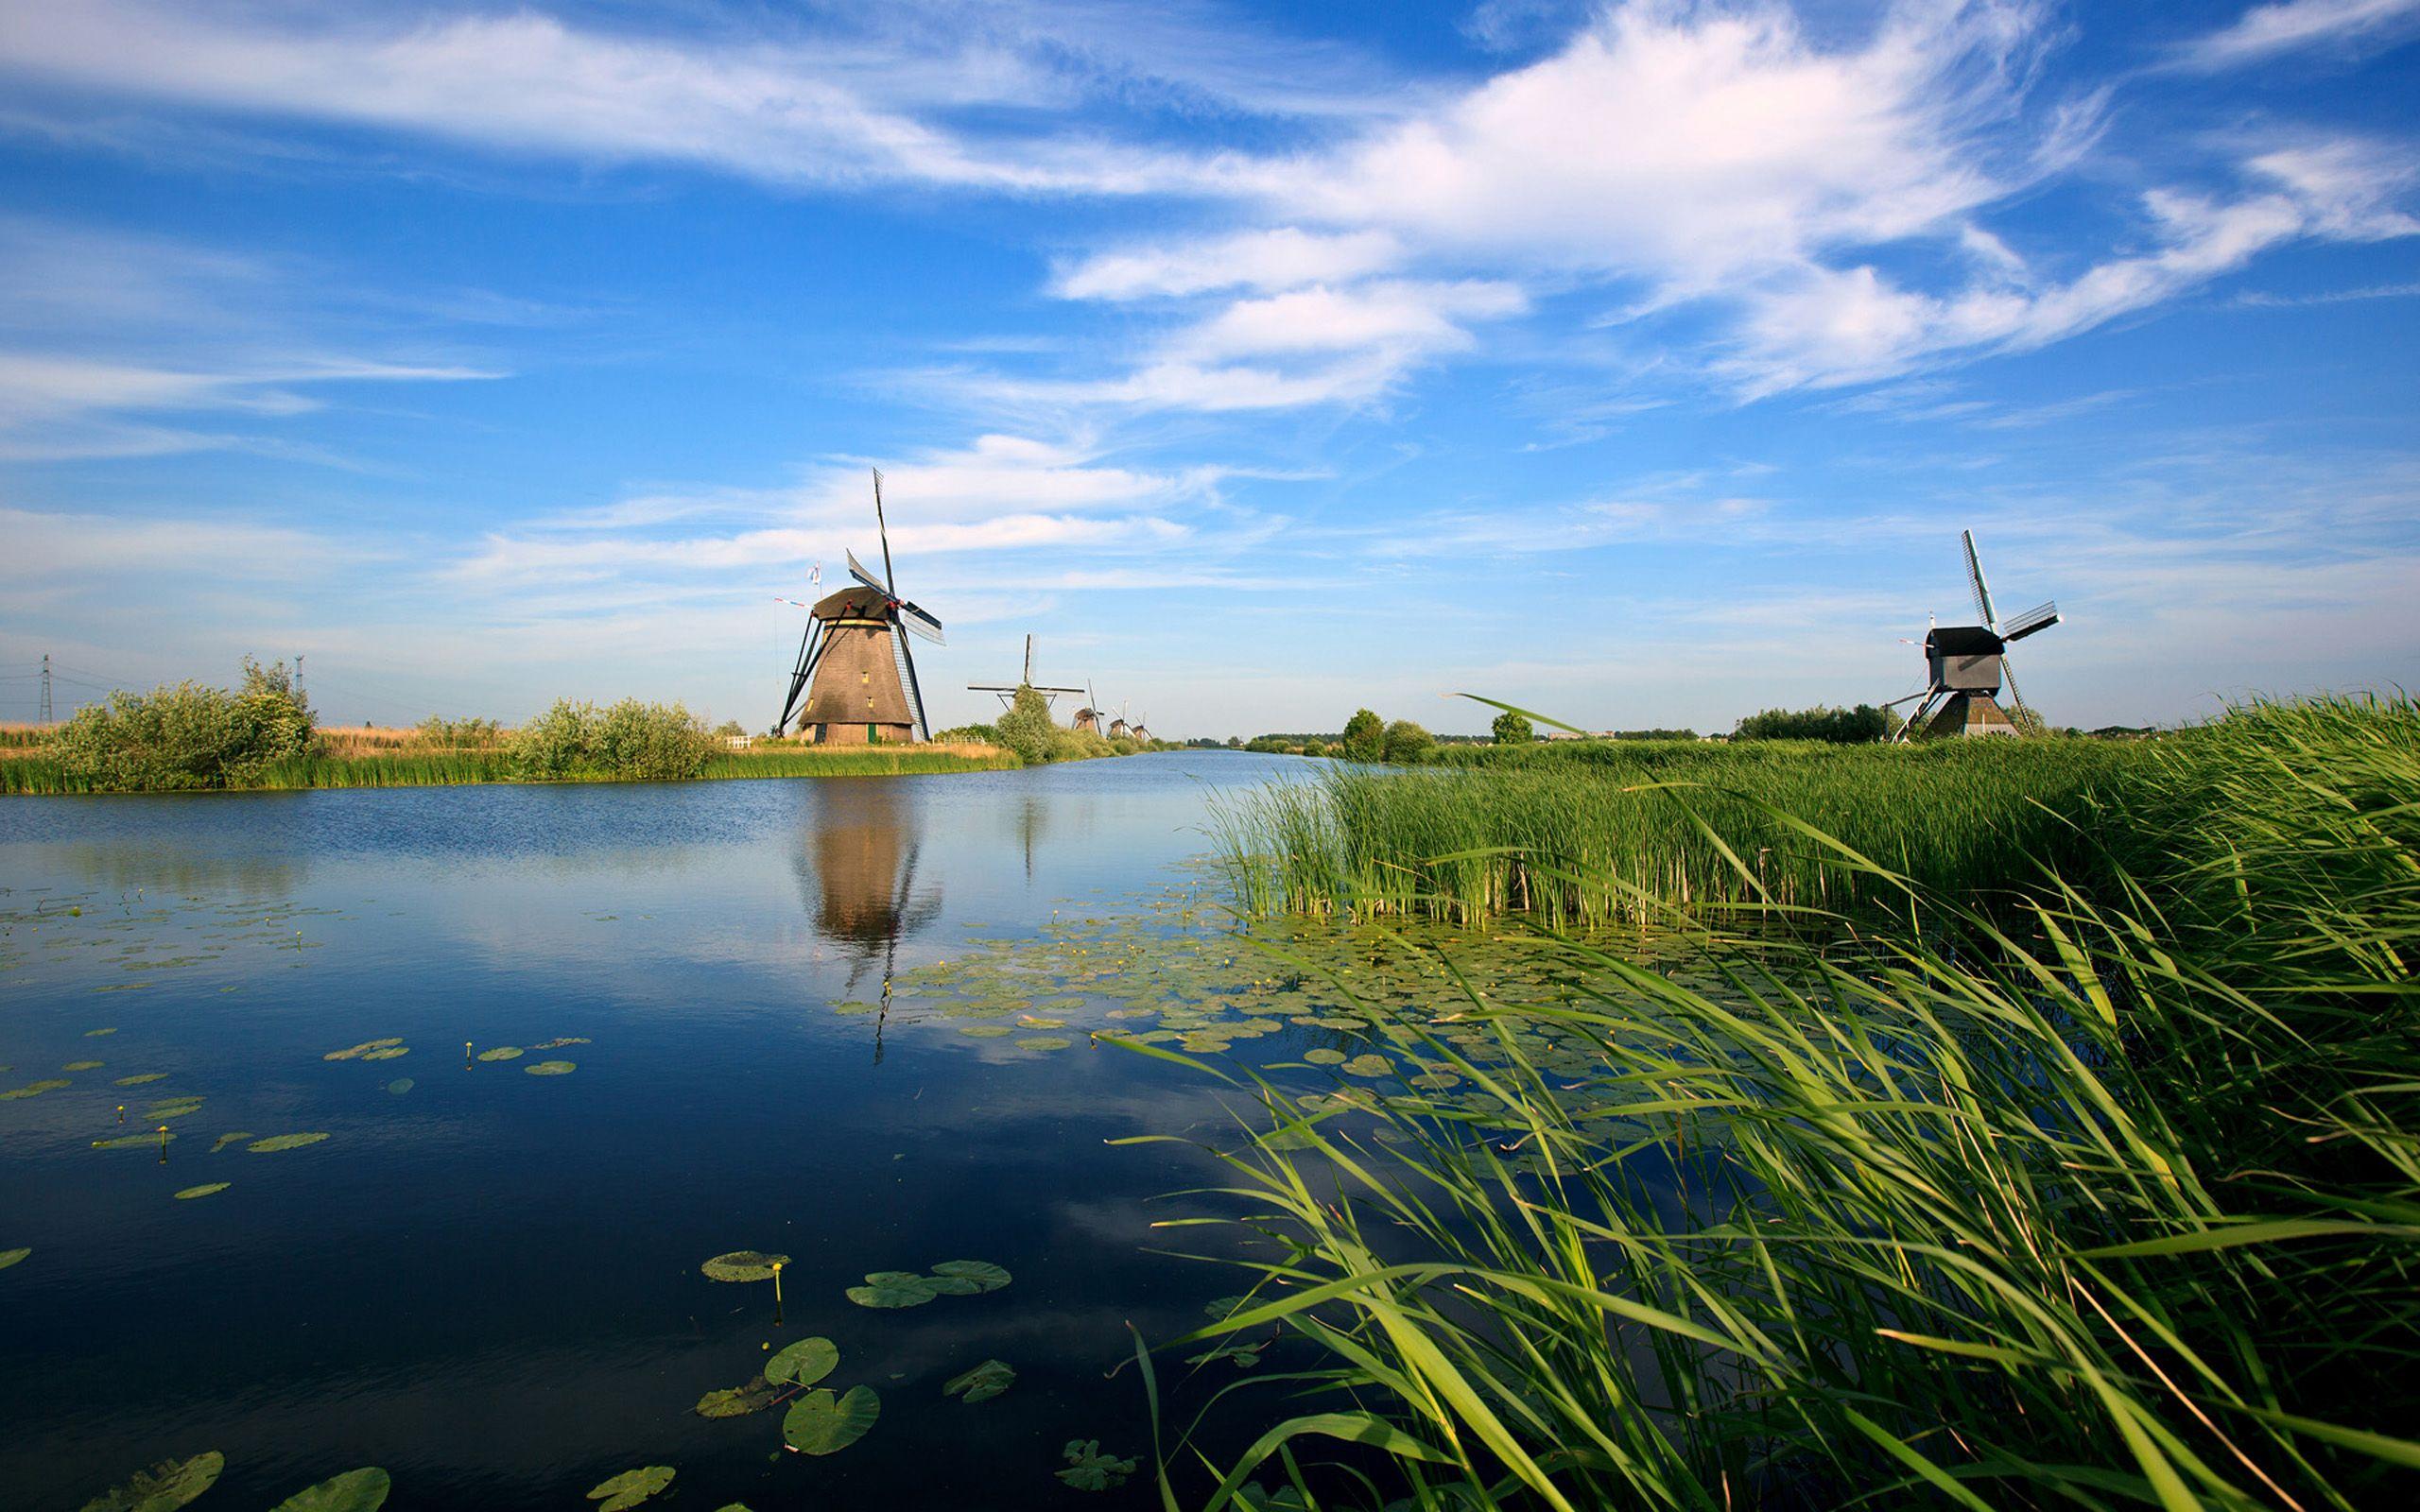 dutch landscape landscapes landschaft krajina paysage paisaje